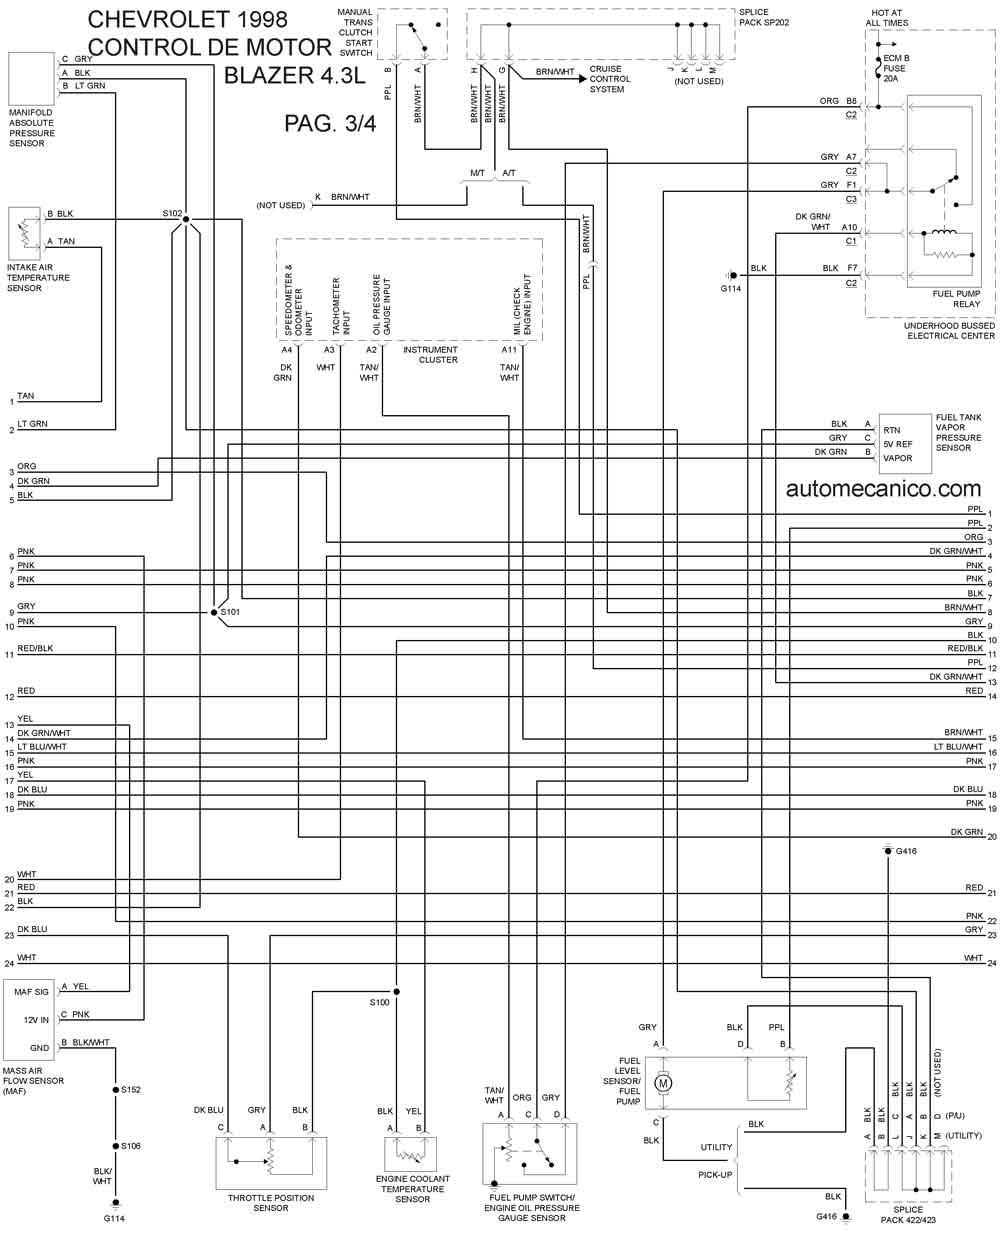 Chevrolet 1998|Diagramas-Esquemas-Graphics|vehiculos